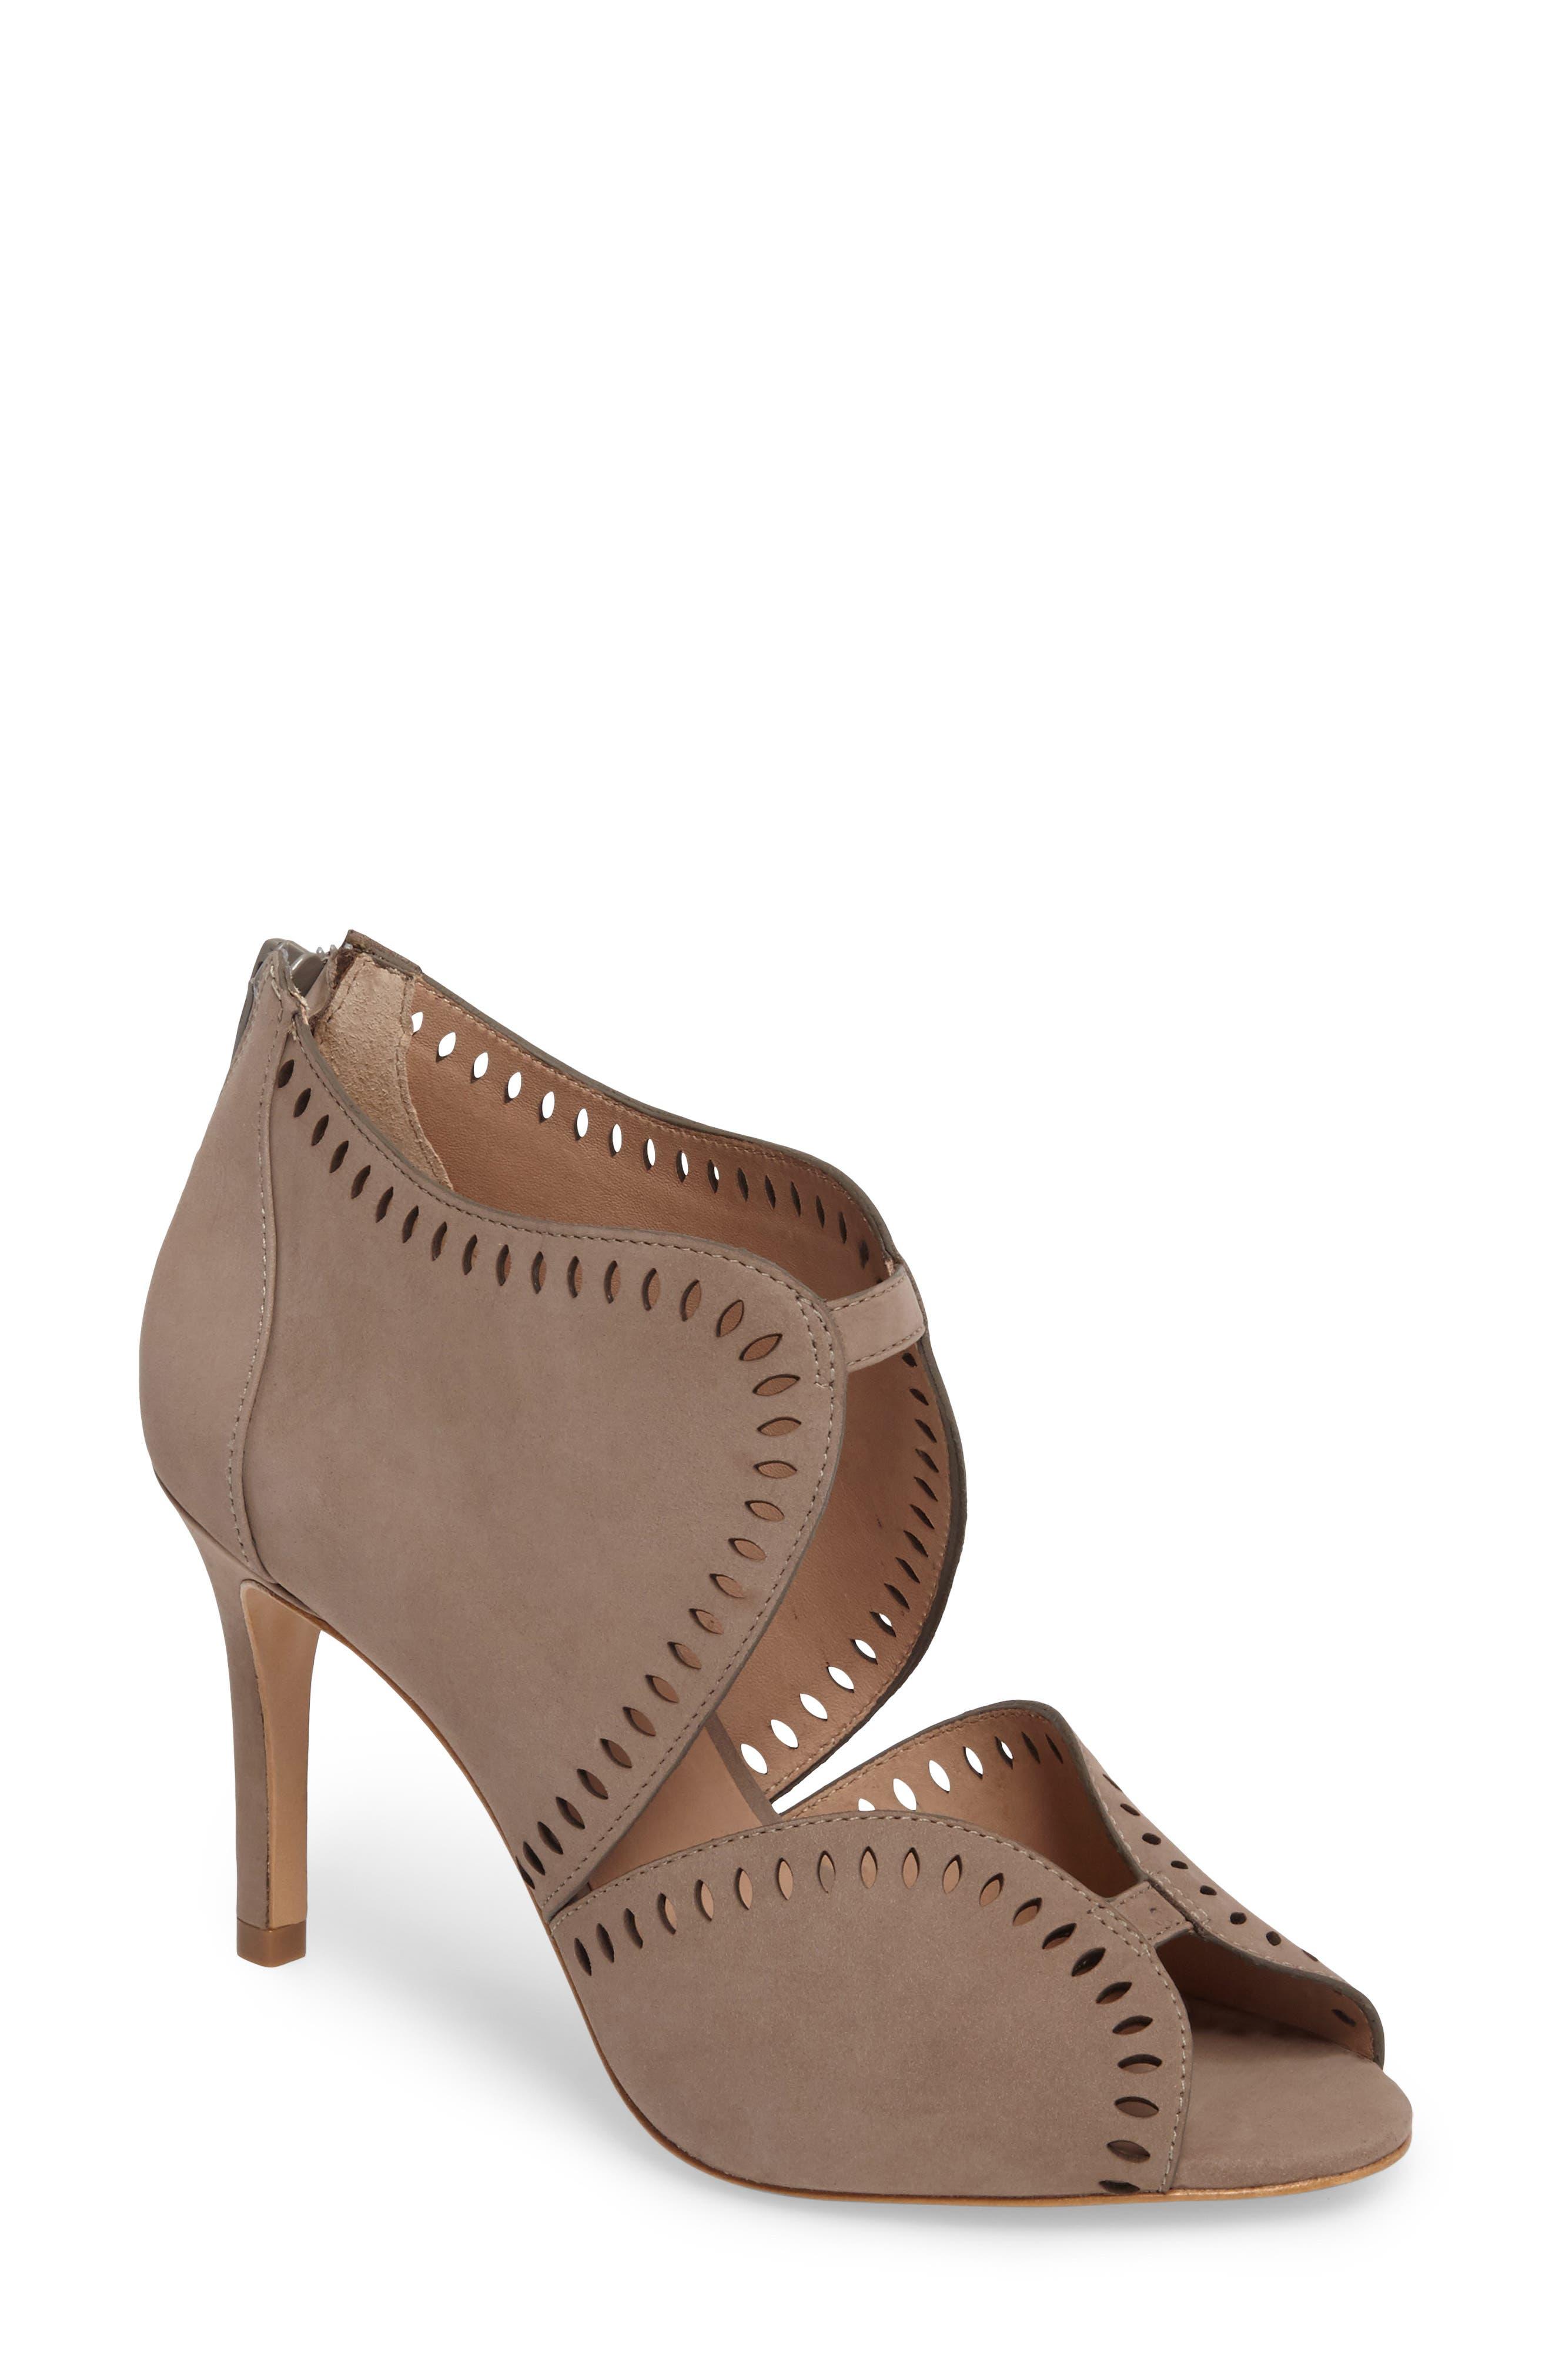 Main Image - Klub Nico Mallia Perforated Sandal (Women)